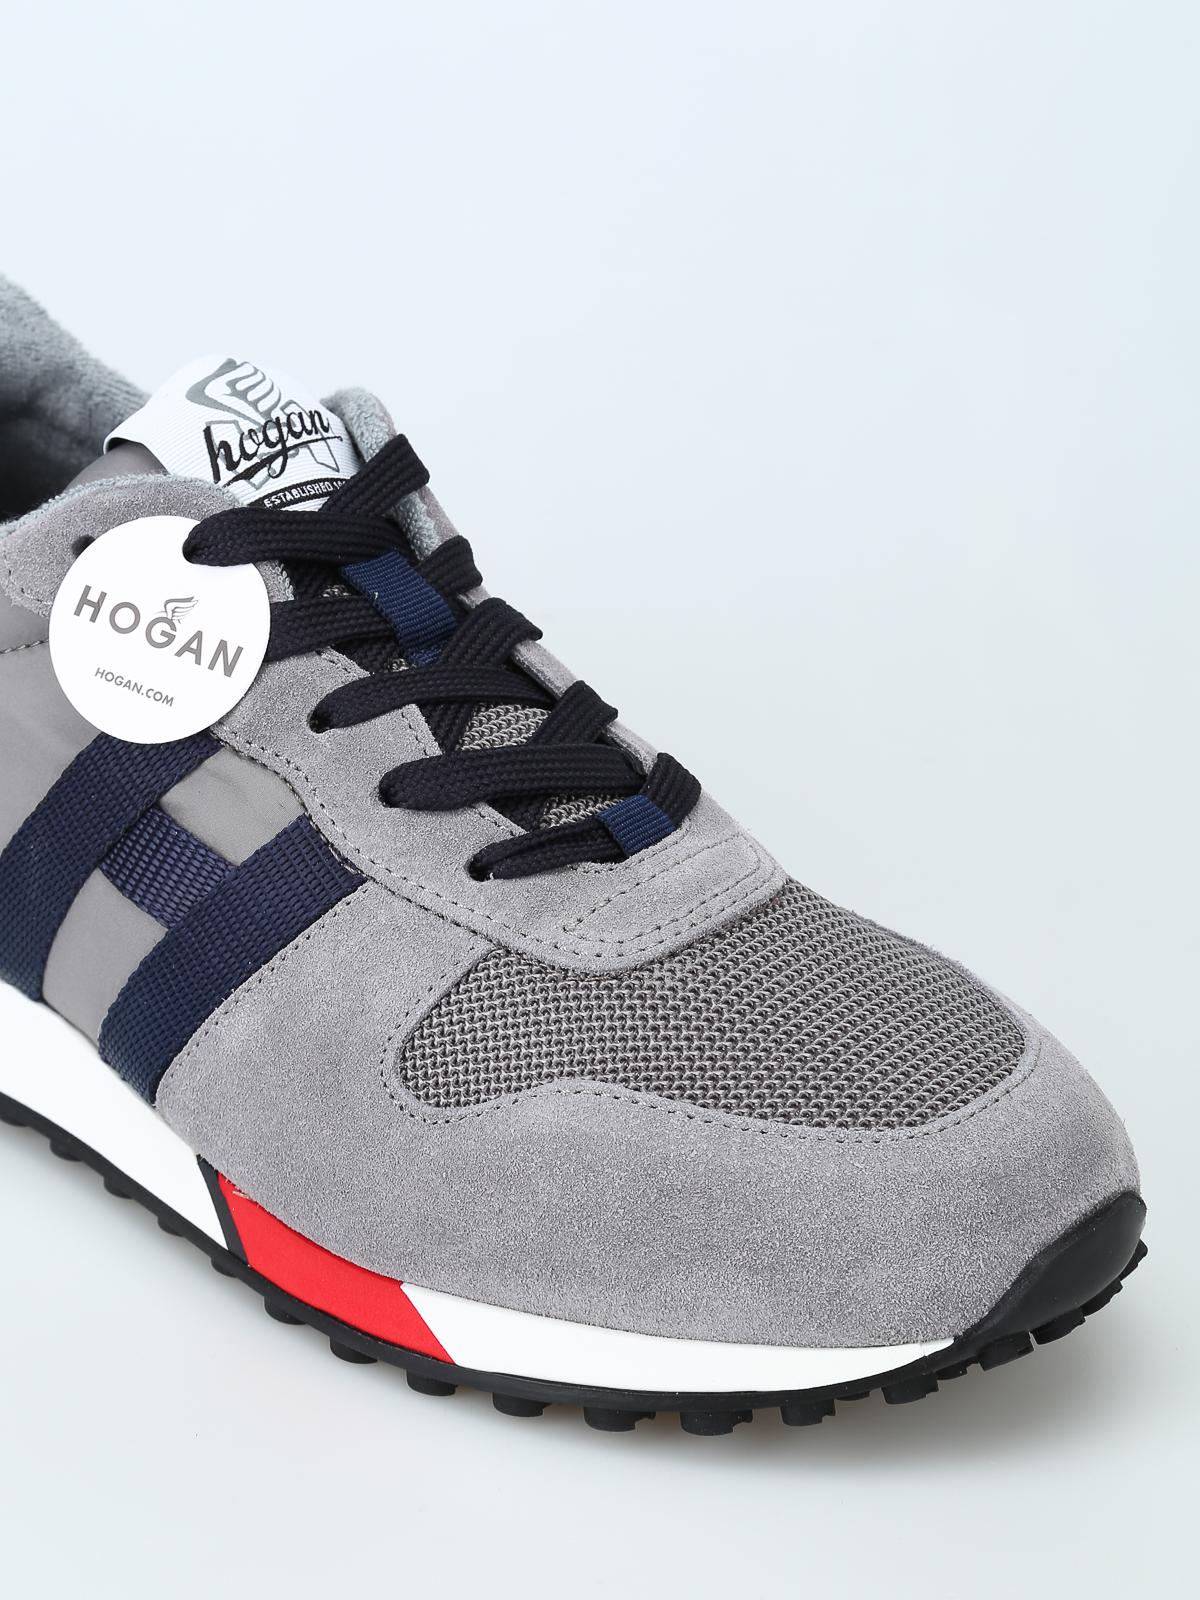 Trainers Hogan - H383 new running light grey sneakers ...